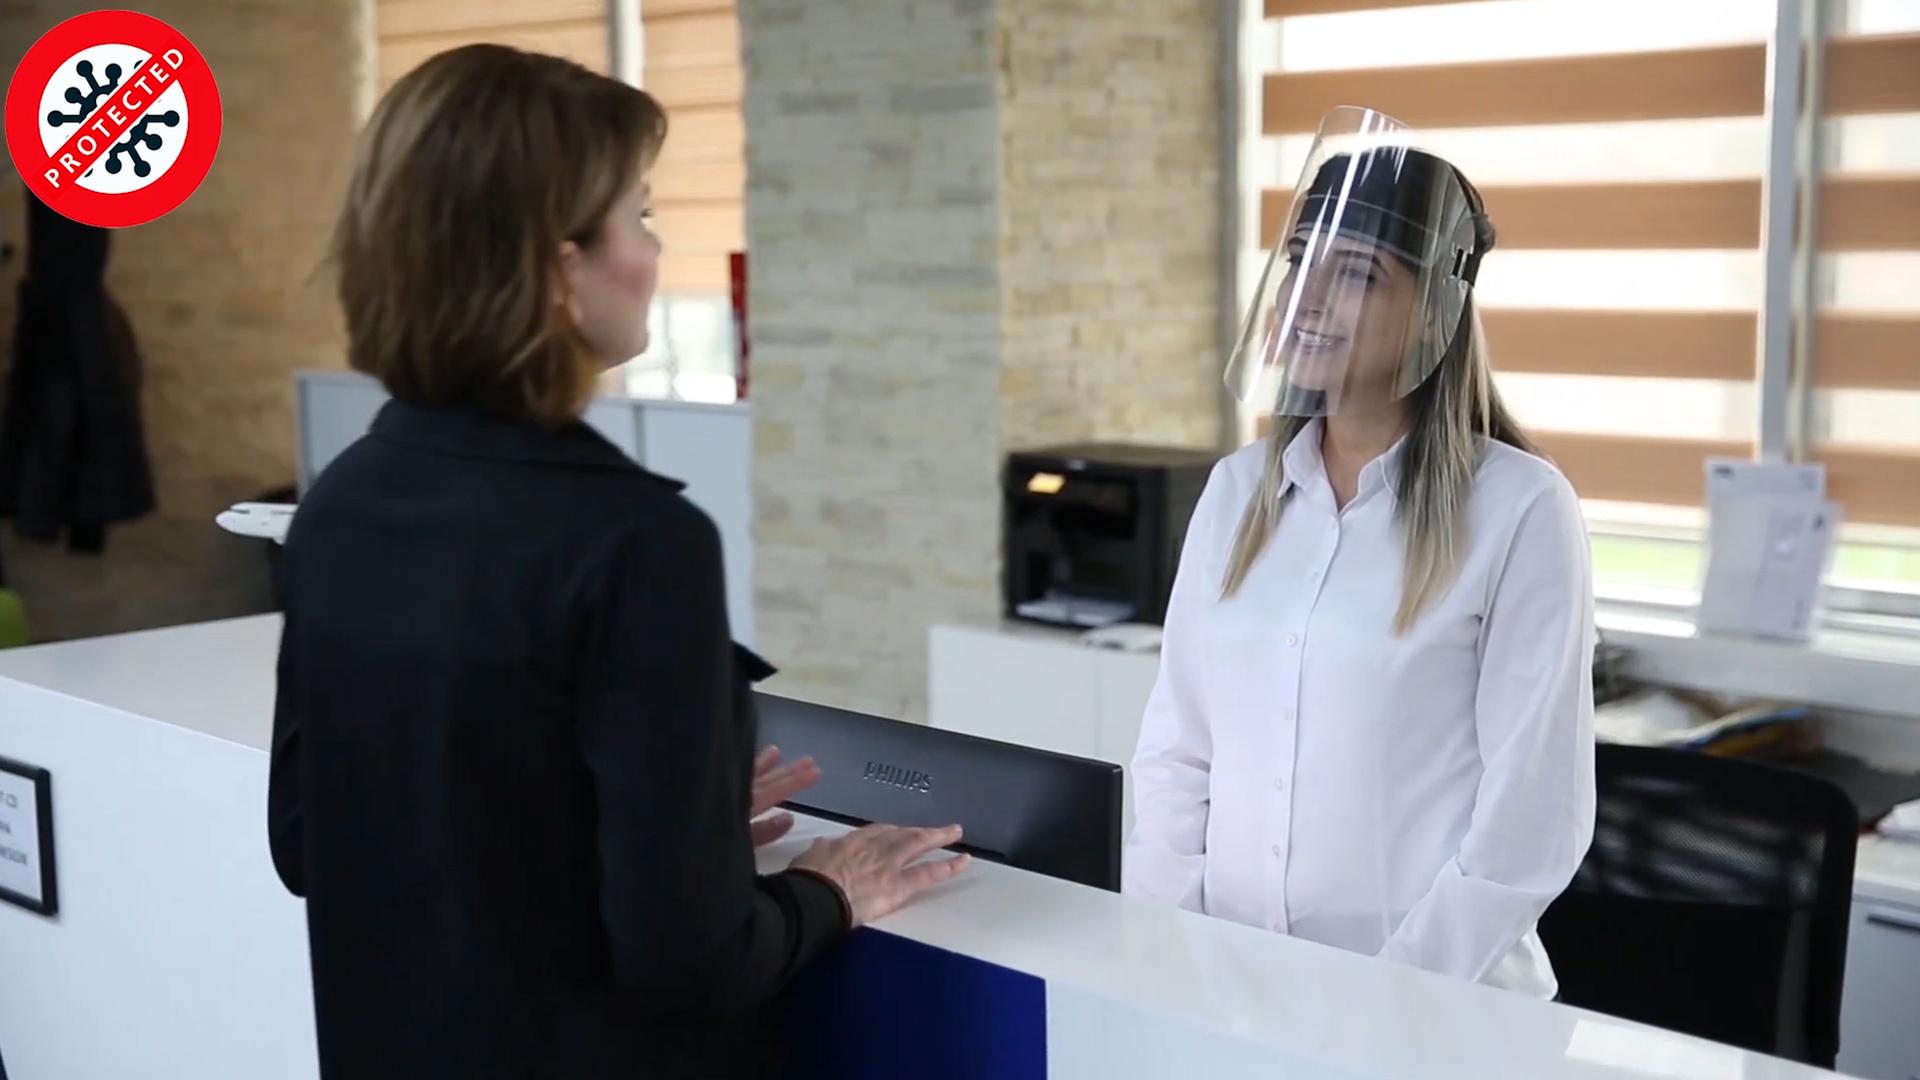 Hygienic-Safety-Face-Shield-Mask-covid-19-coronavirus-presentation